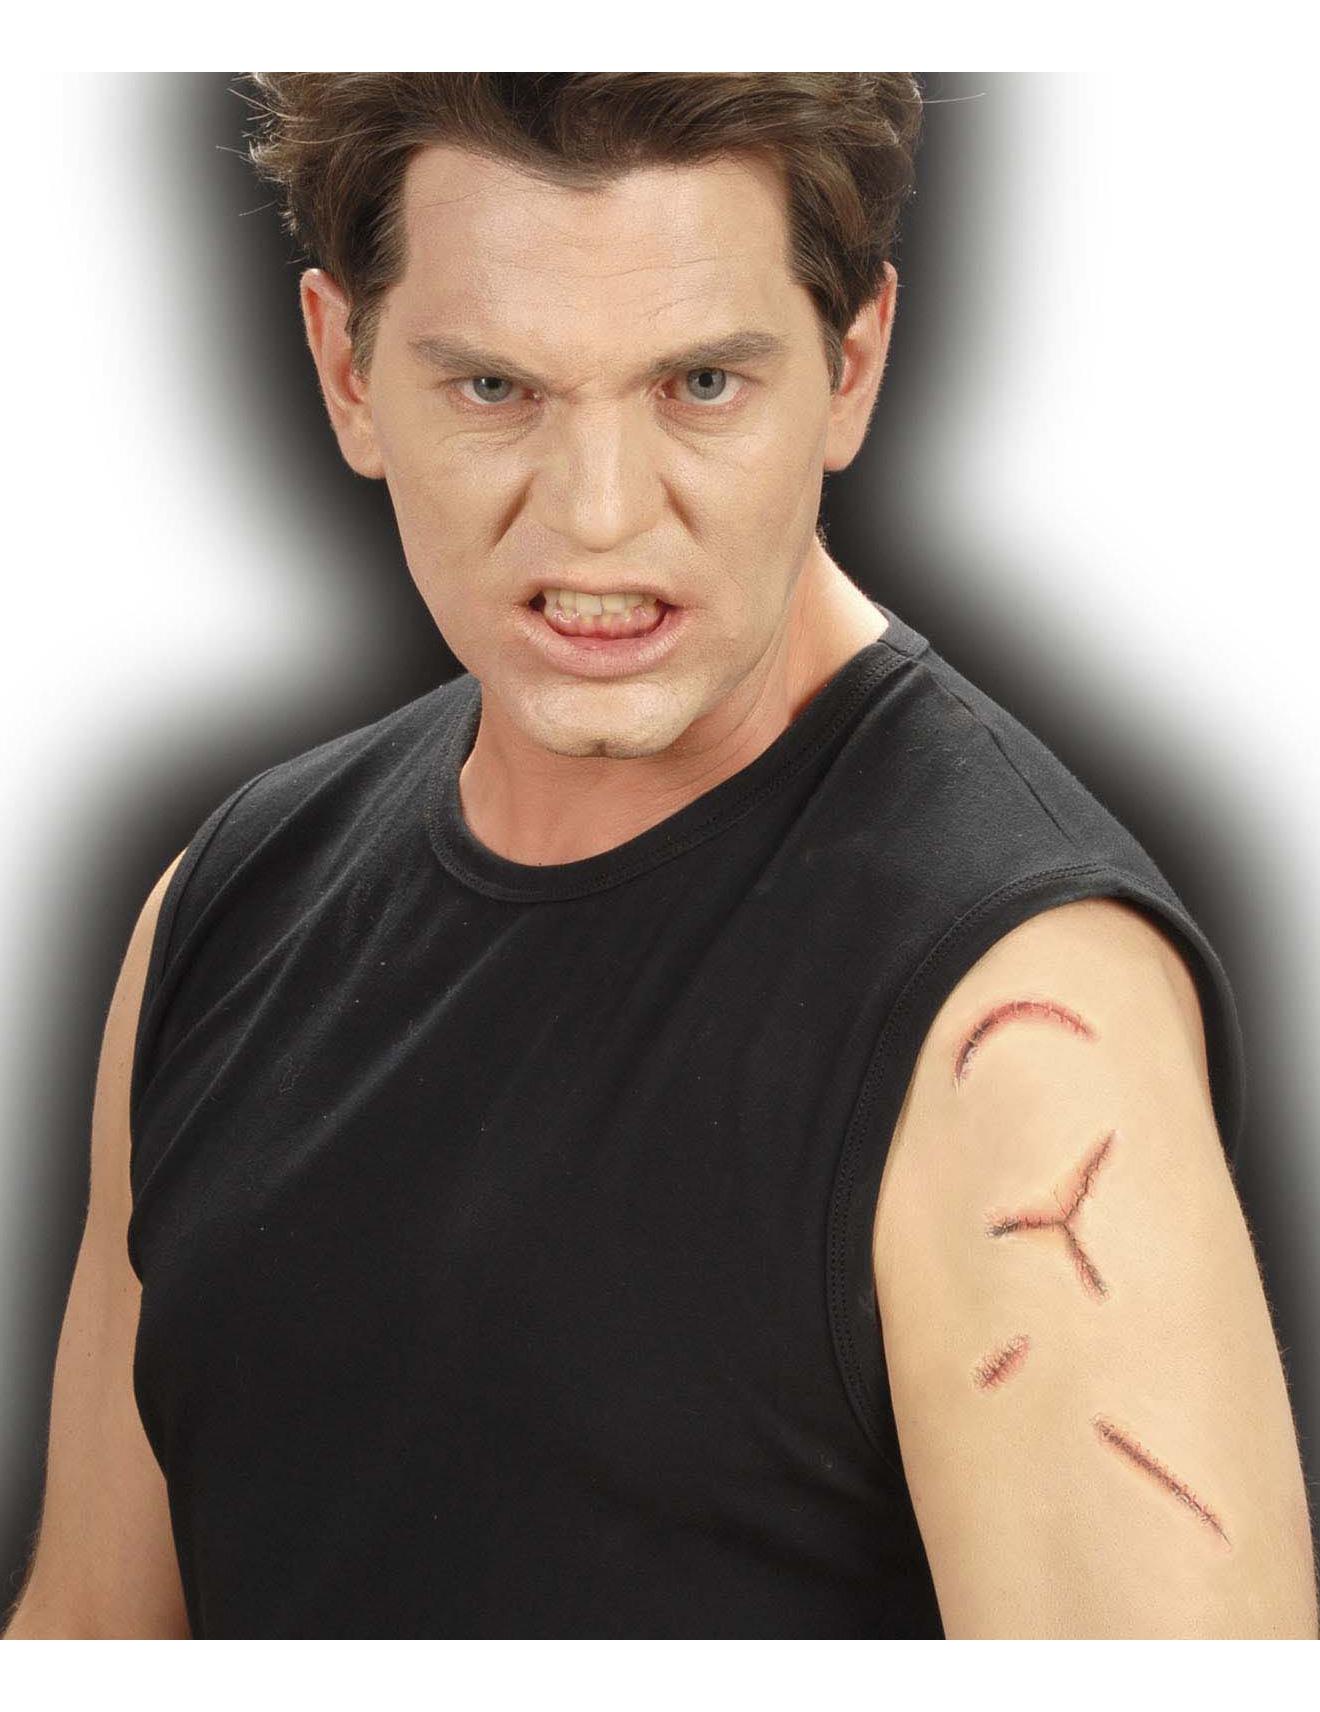 Fausses cicatrices recousues adulte halloween achat de maquillage sur vegaoopro grossiste en - Maquillage halloween cicatrice ...